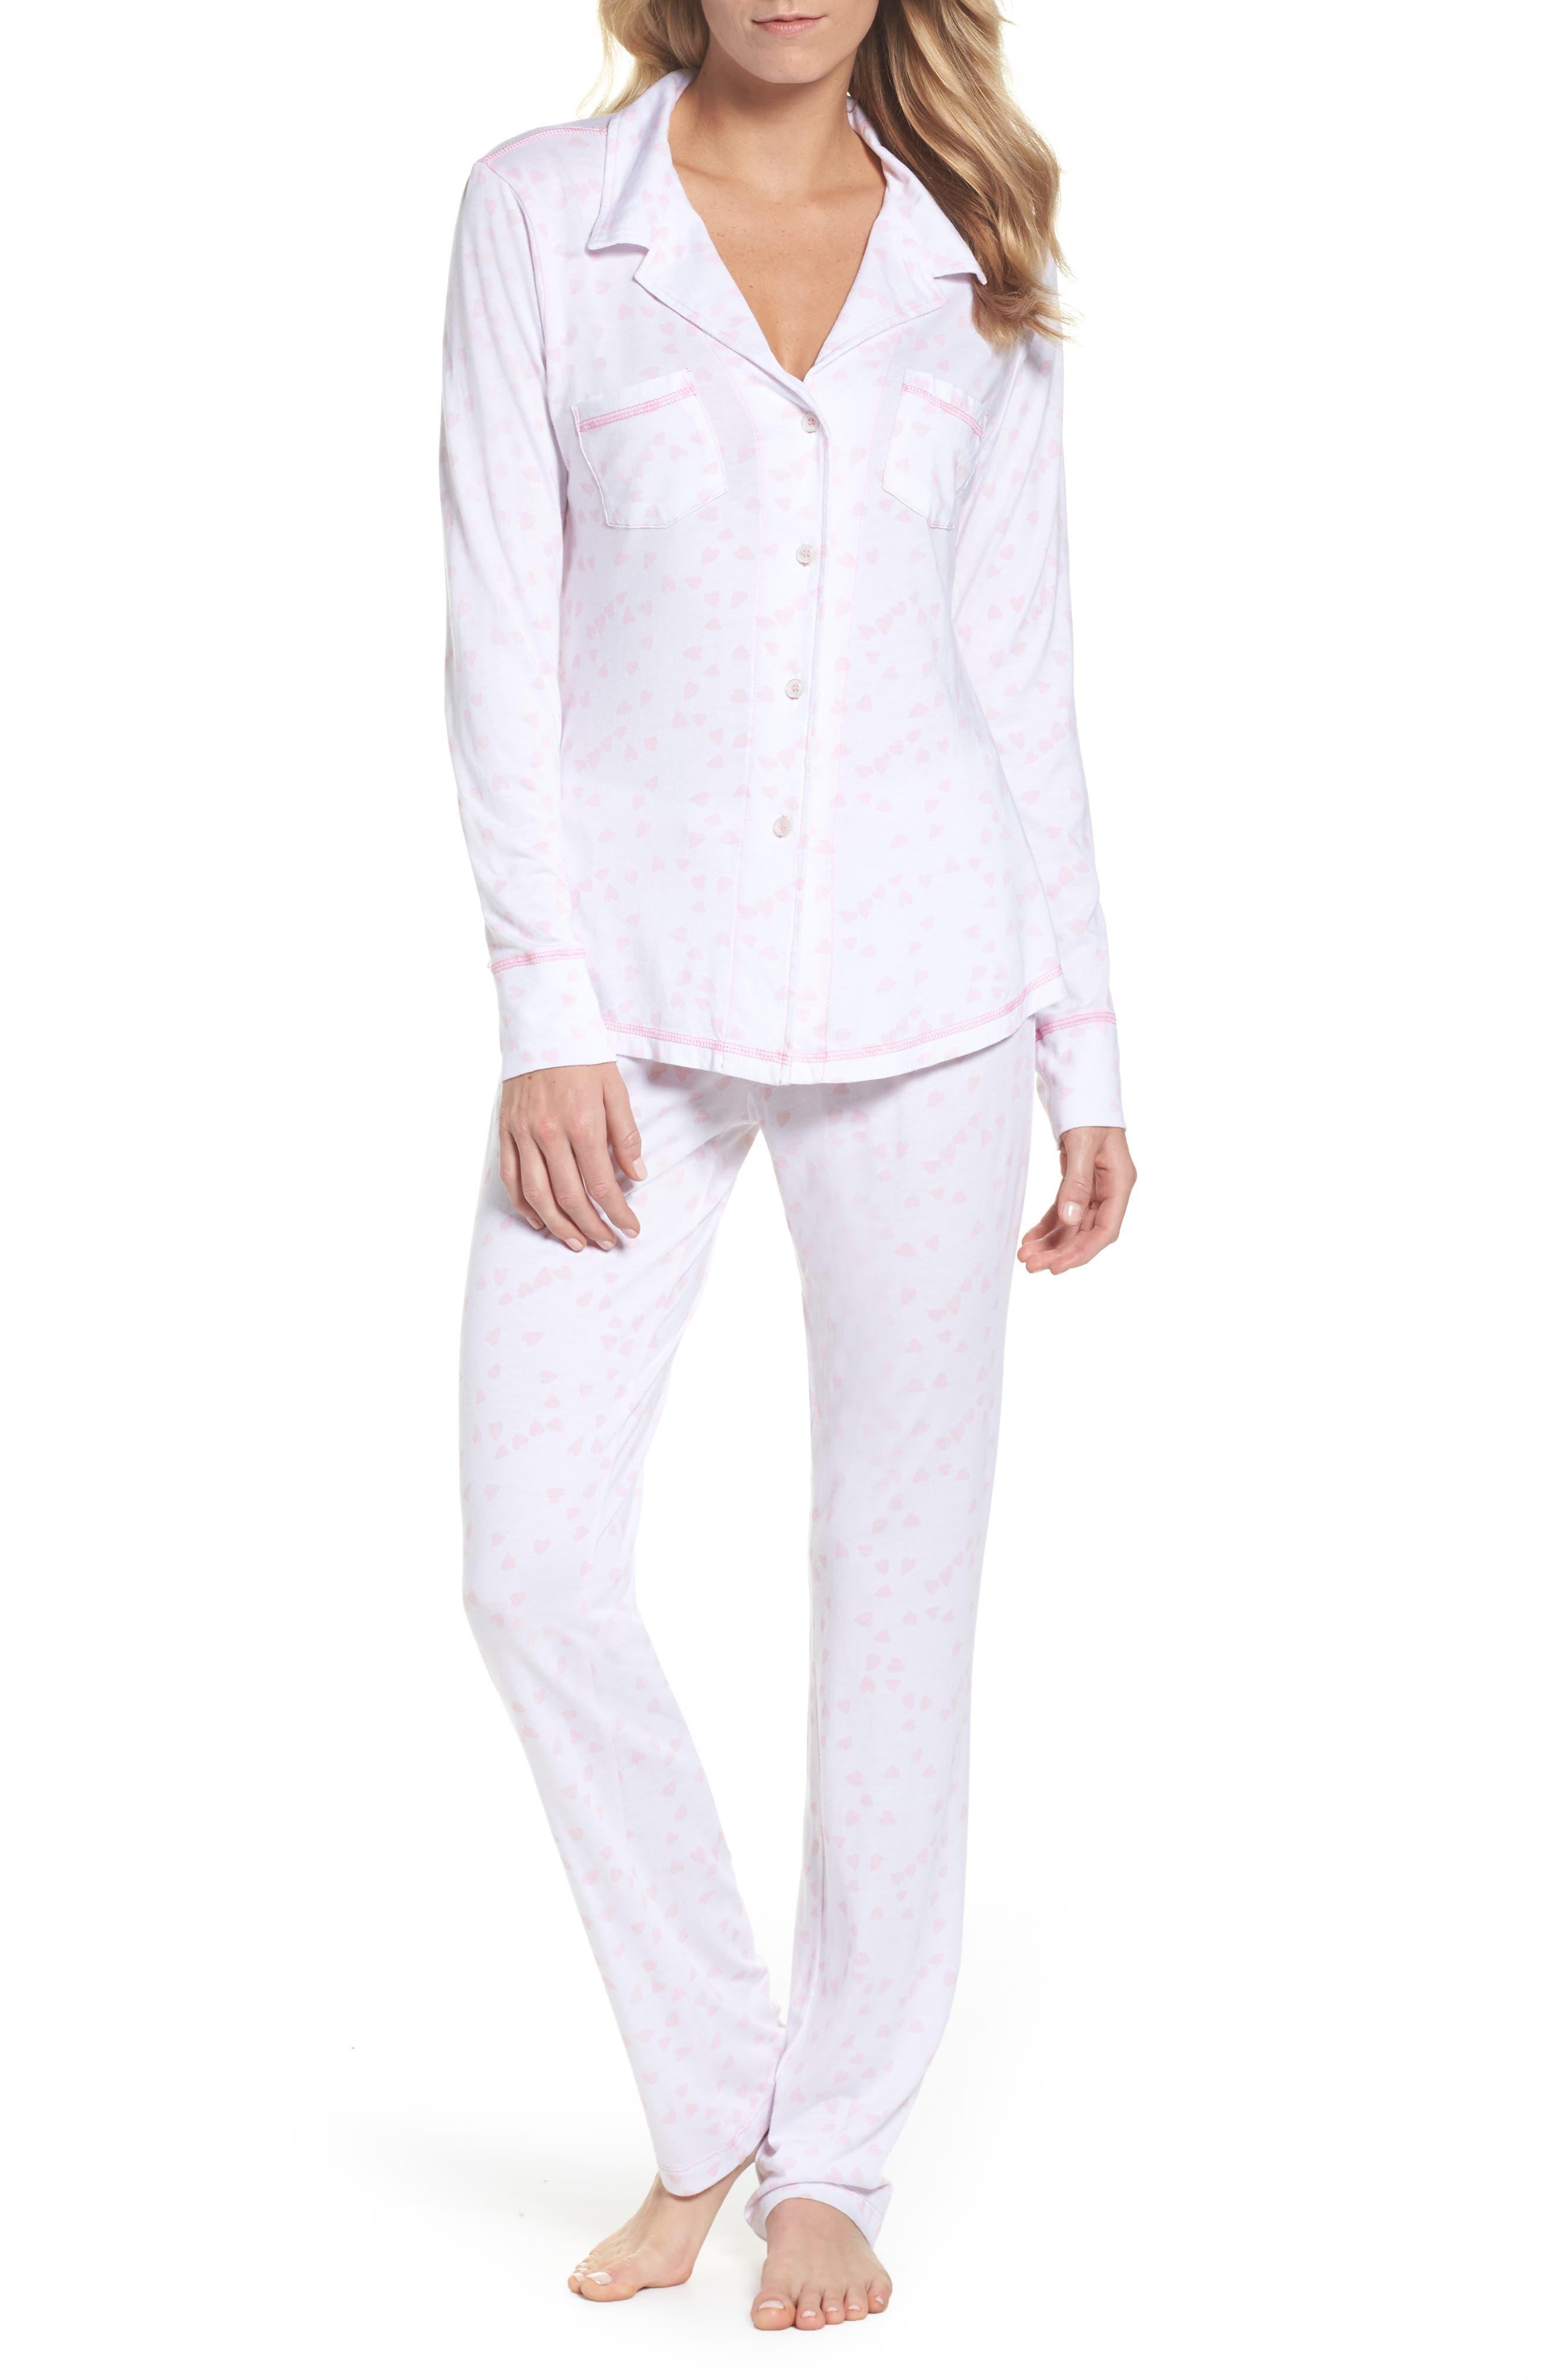 Cassie Pajamas,                             Main thumbnail 1, color,                             650